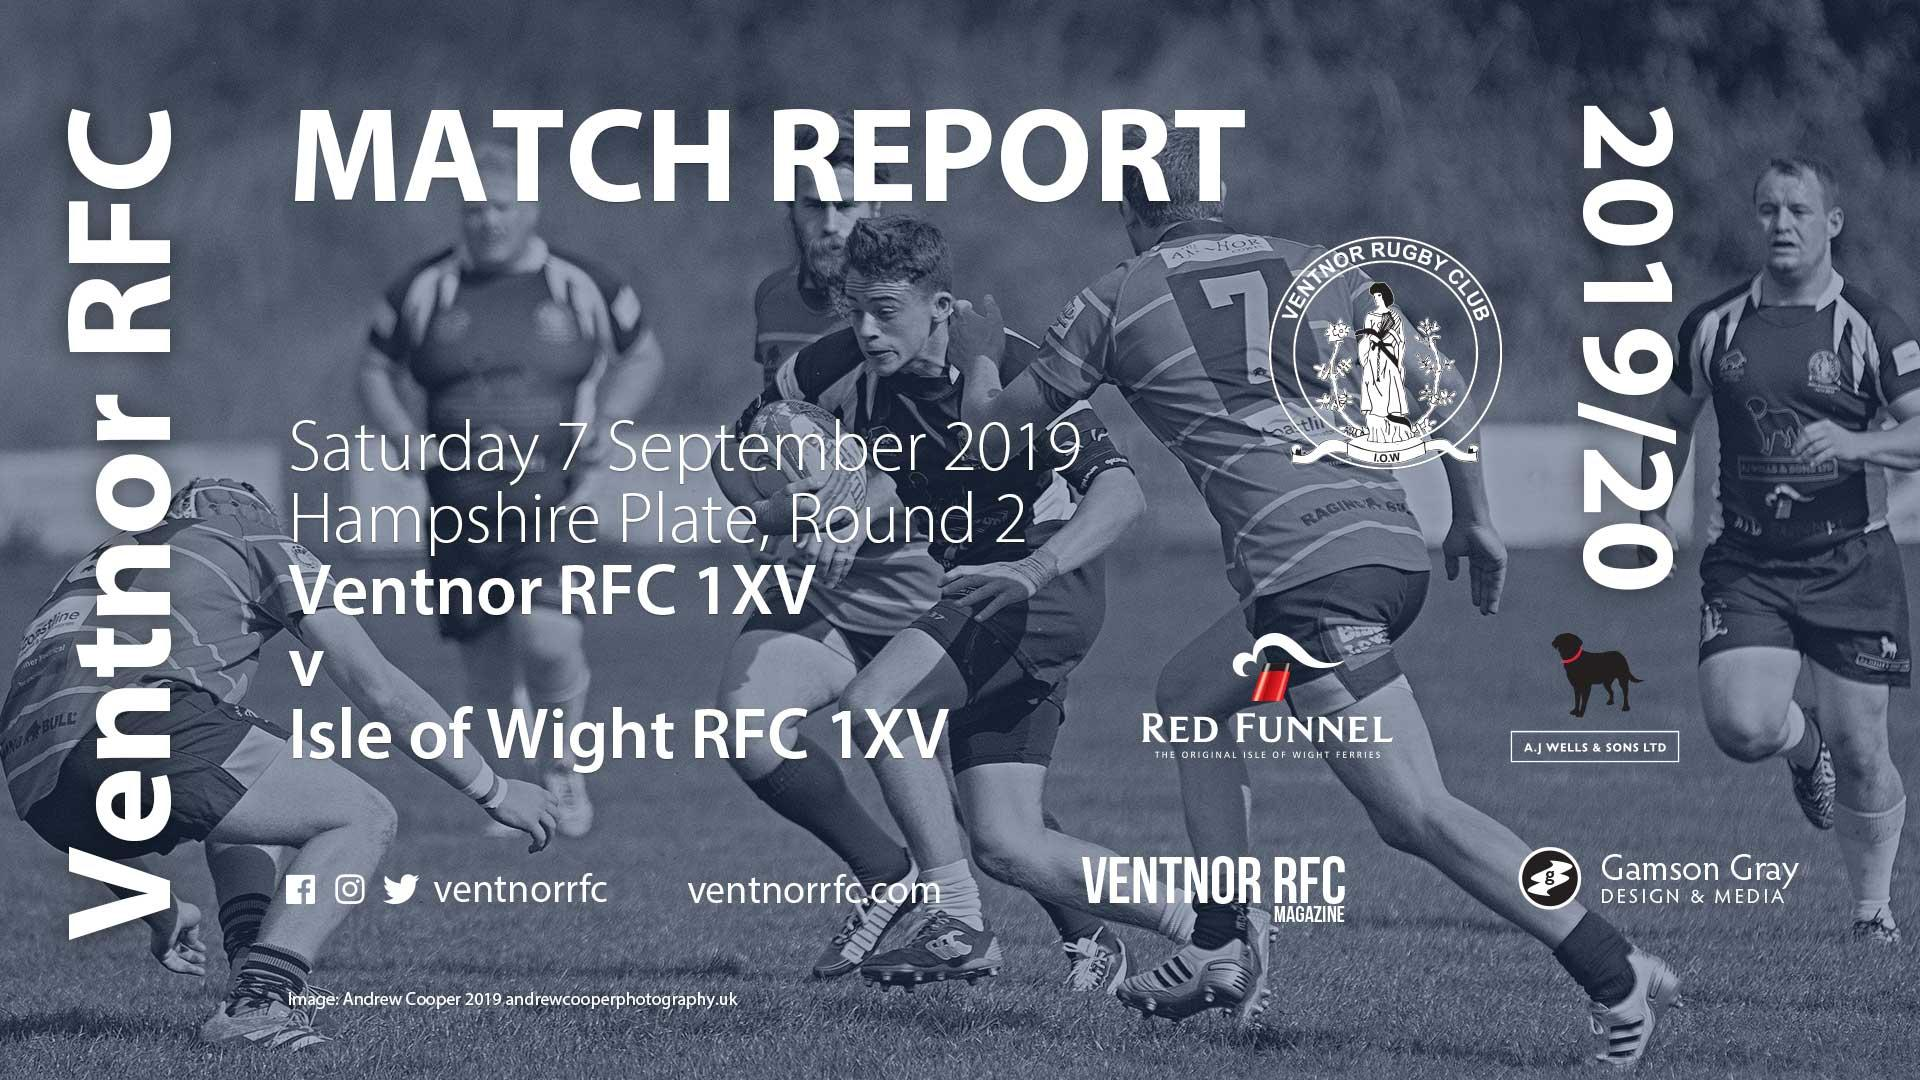 ventnor-rfc-1xv-v-isle-ofwight-rfc-1xv-hampshire-plate-round-2-match-report-ventnorrfc.com